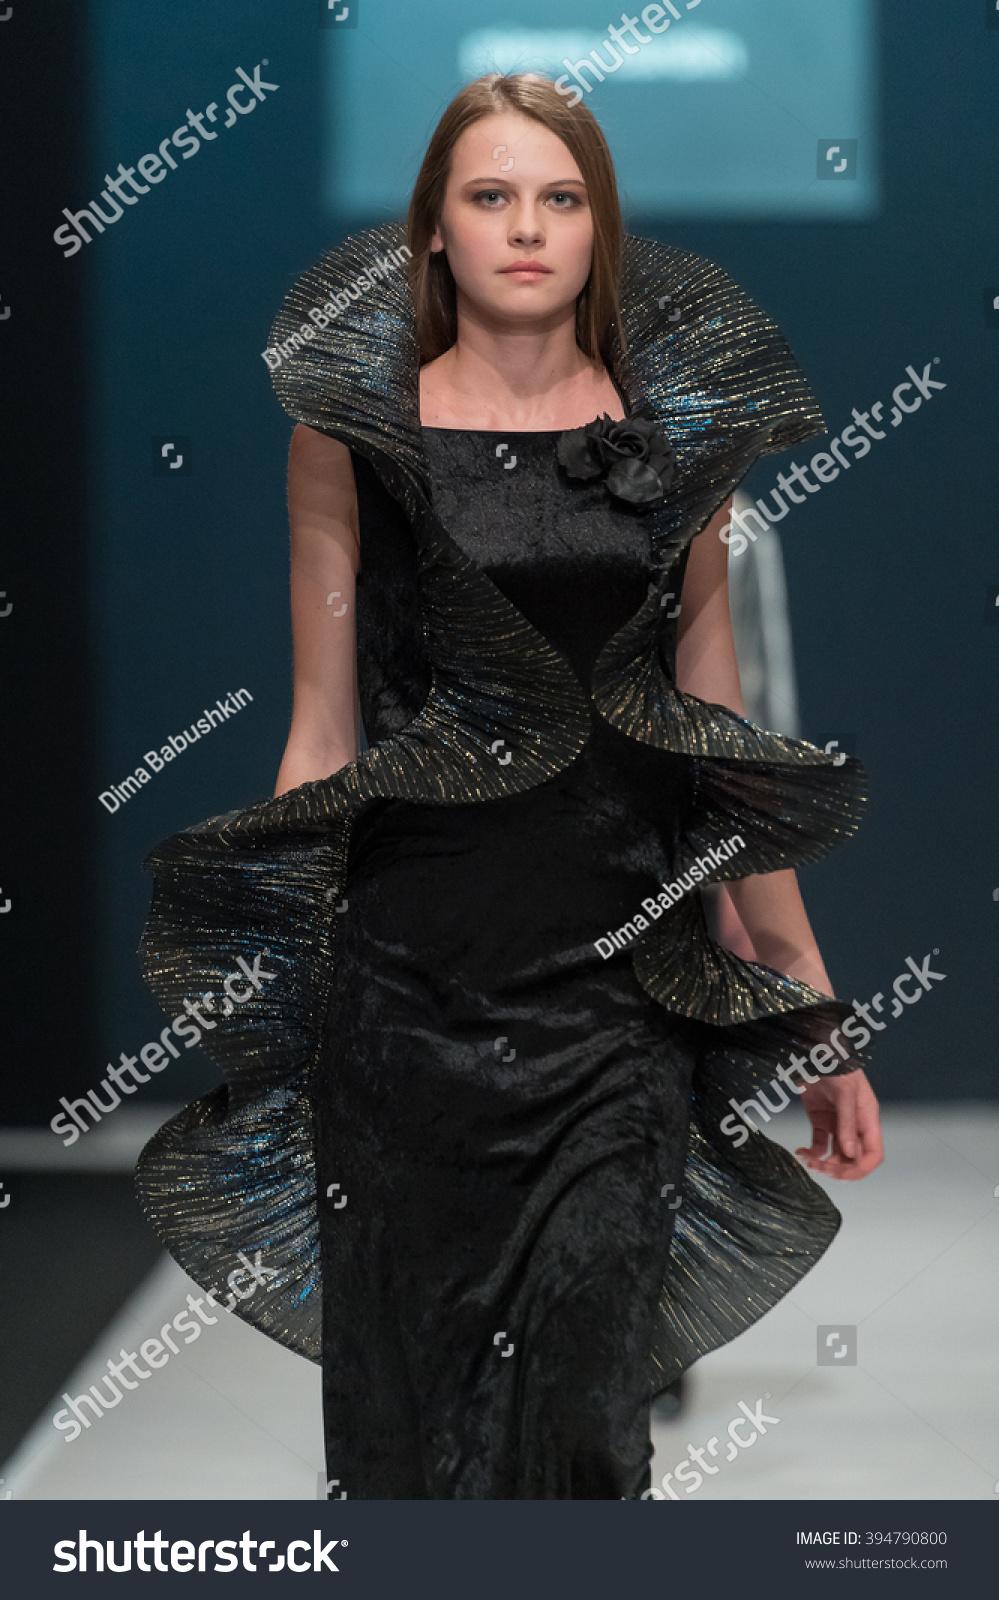 barcelona january 26 a model walks on the justicia ruano catwalk